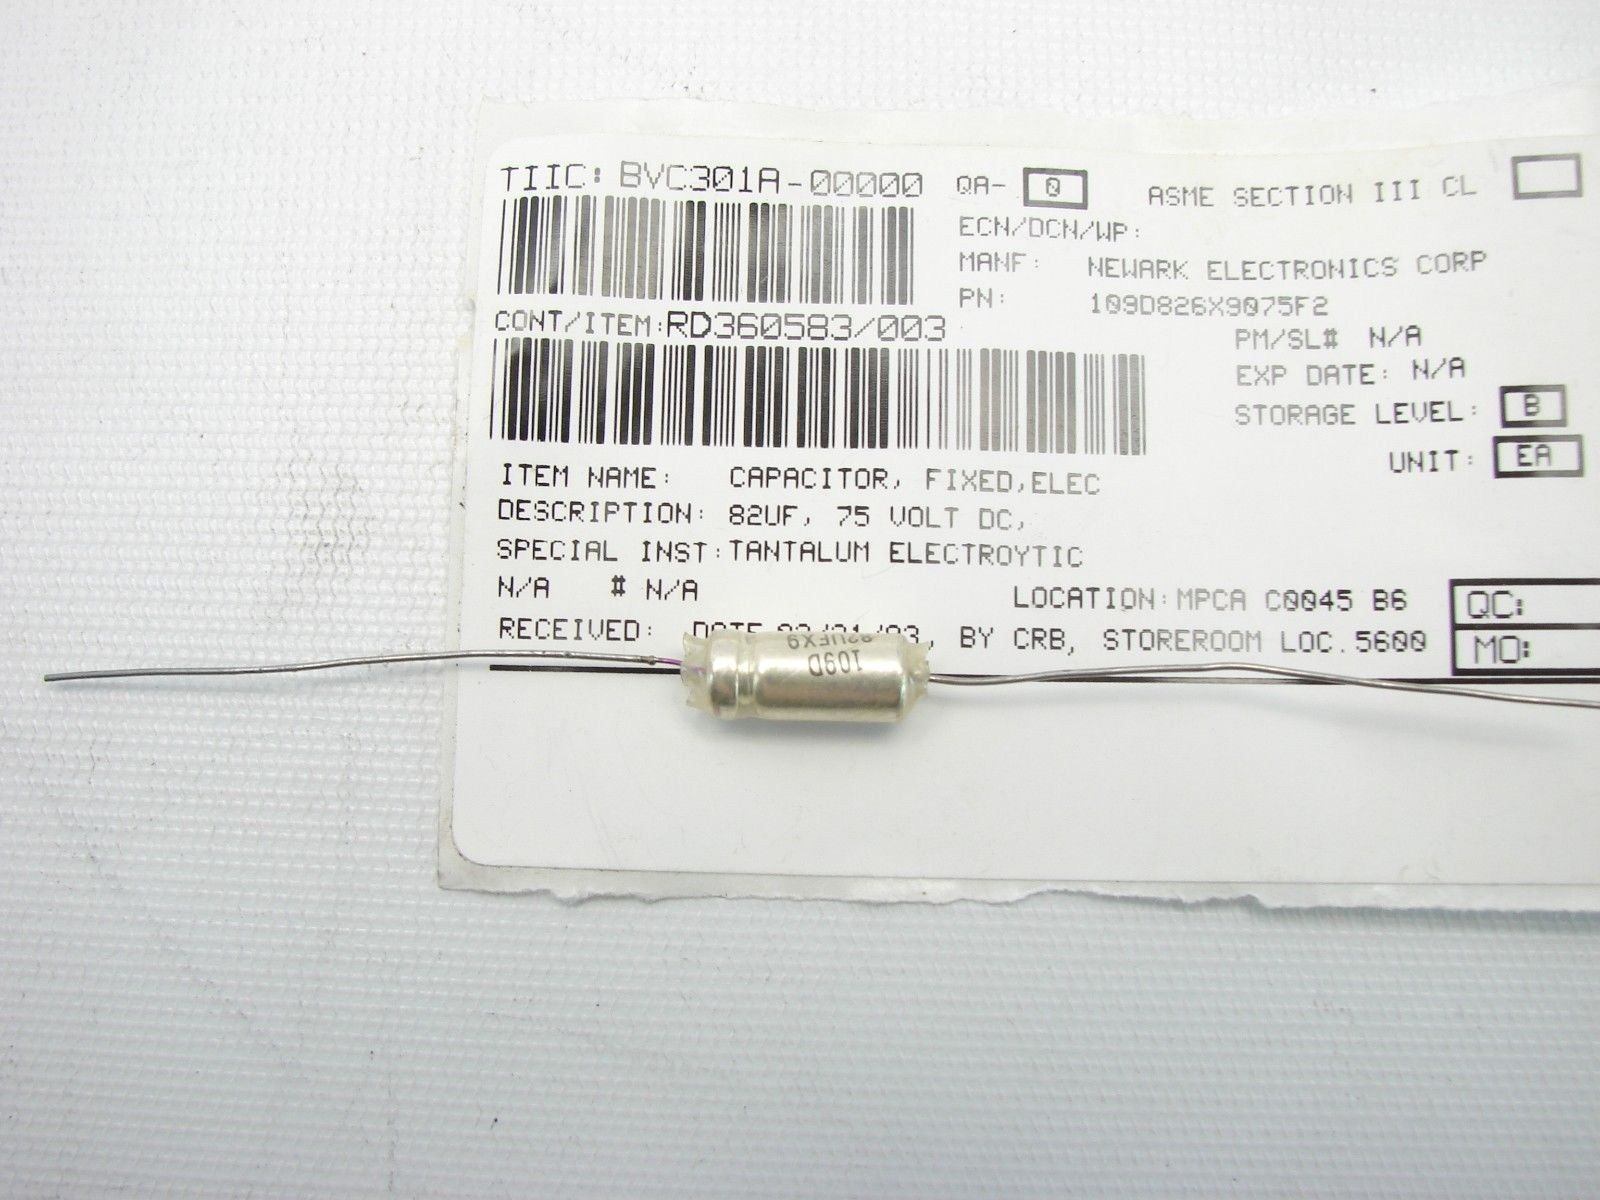 Vishay 109D826X9075F2 Tantalum Capacitor, Sintered Anode